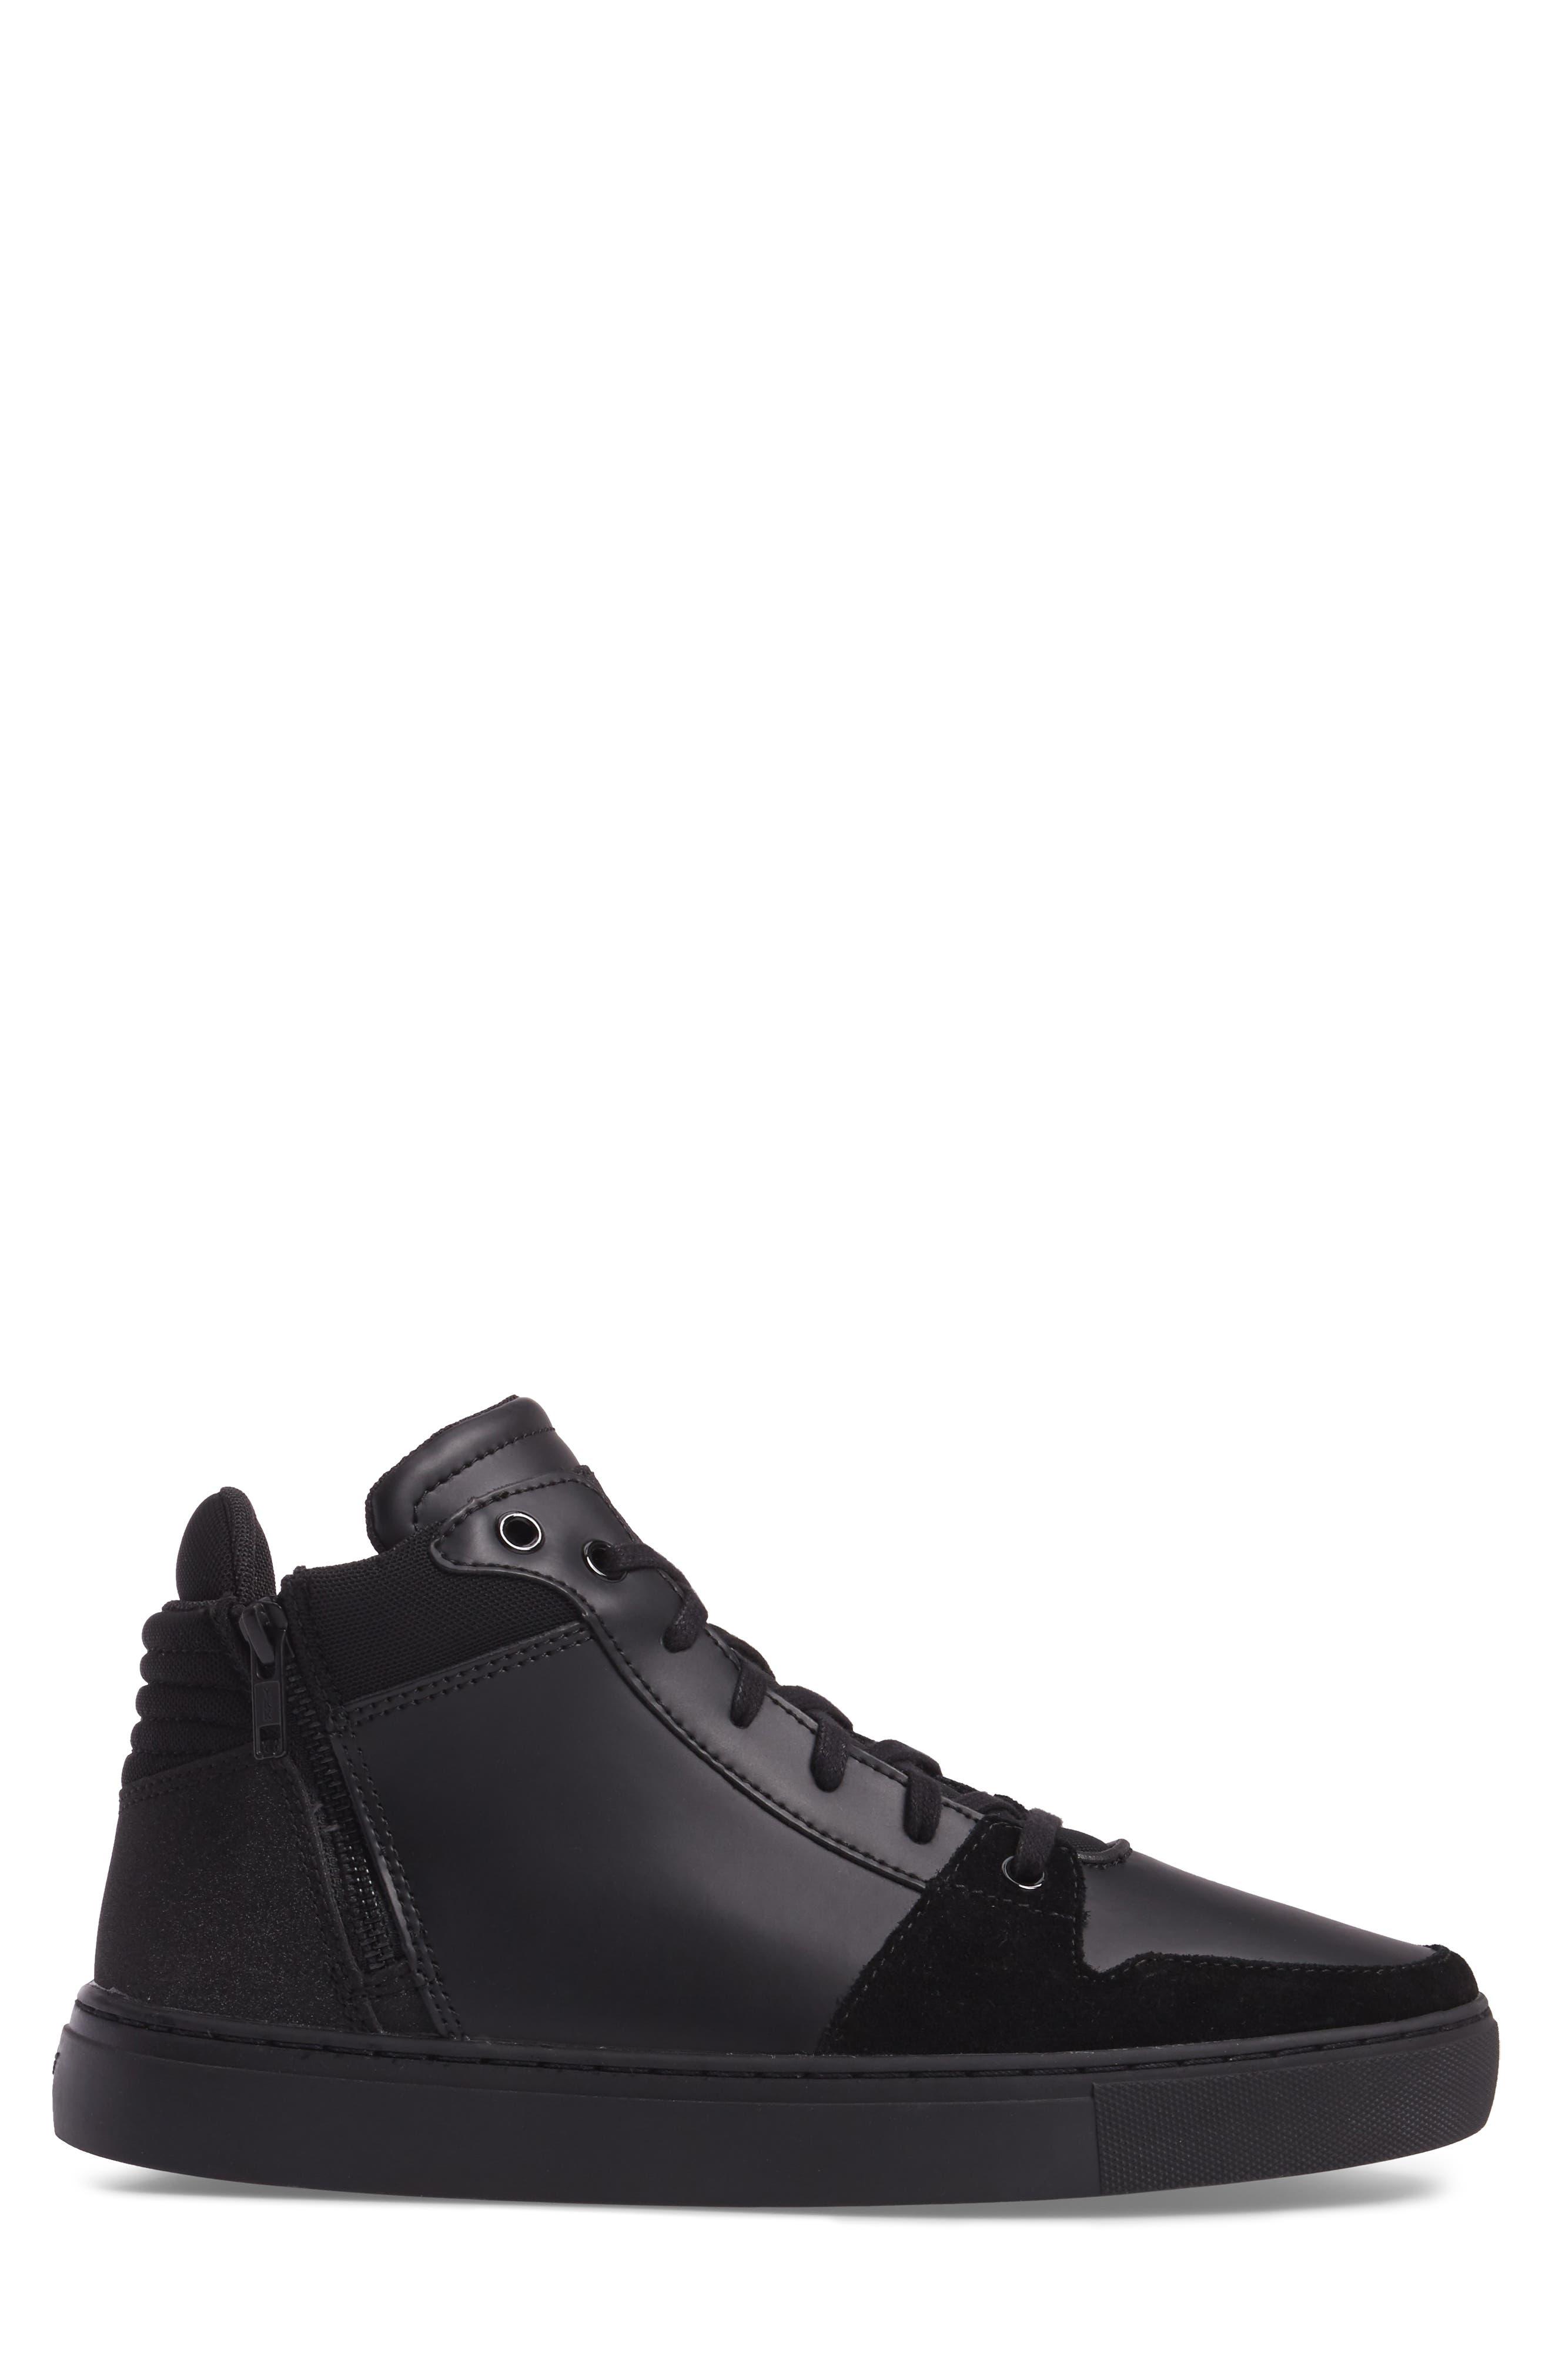 Modena Sneaker,                             Alternate thumbnail 3, color,